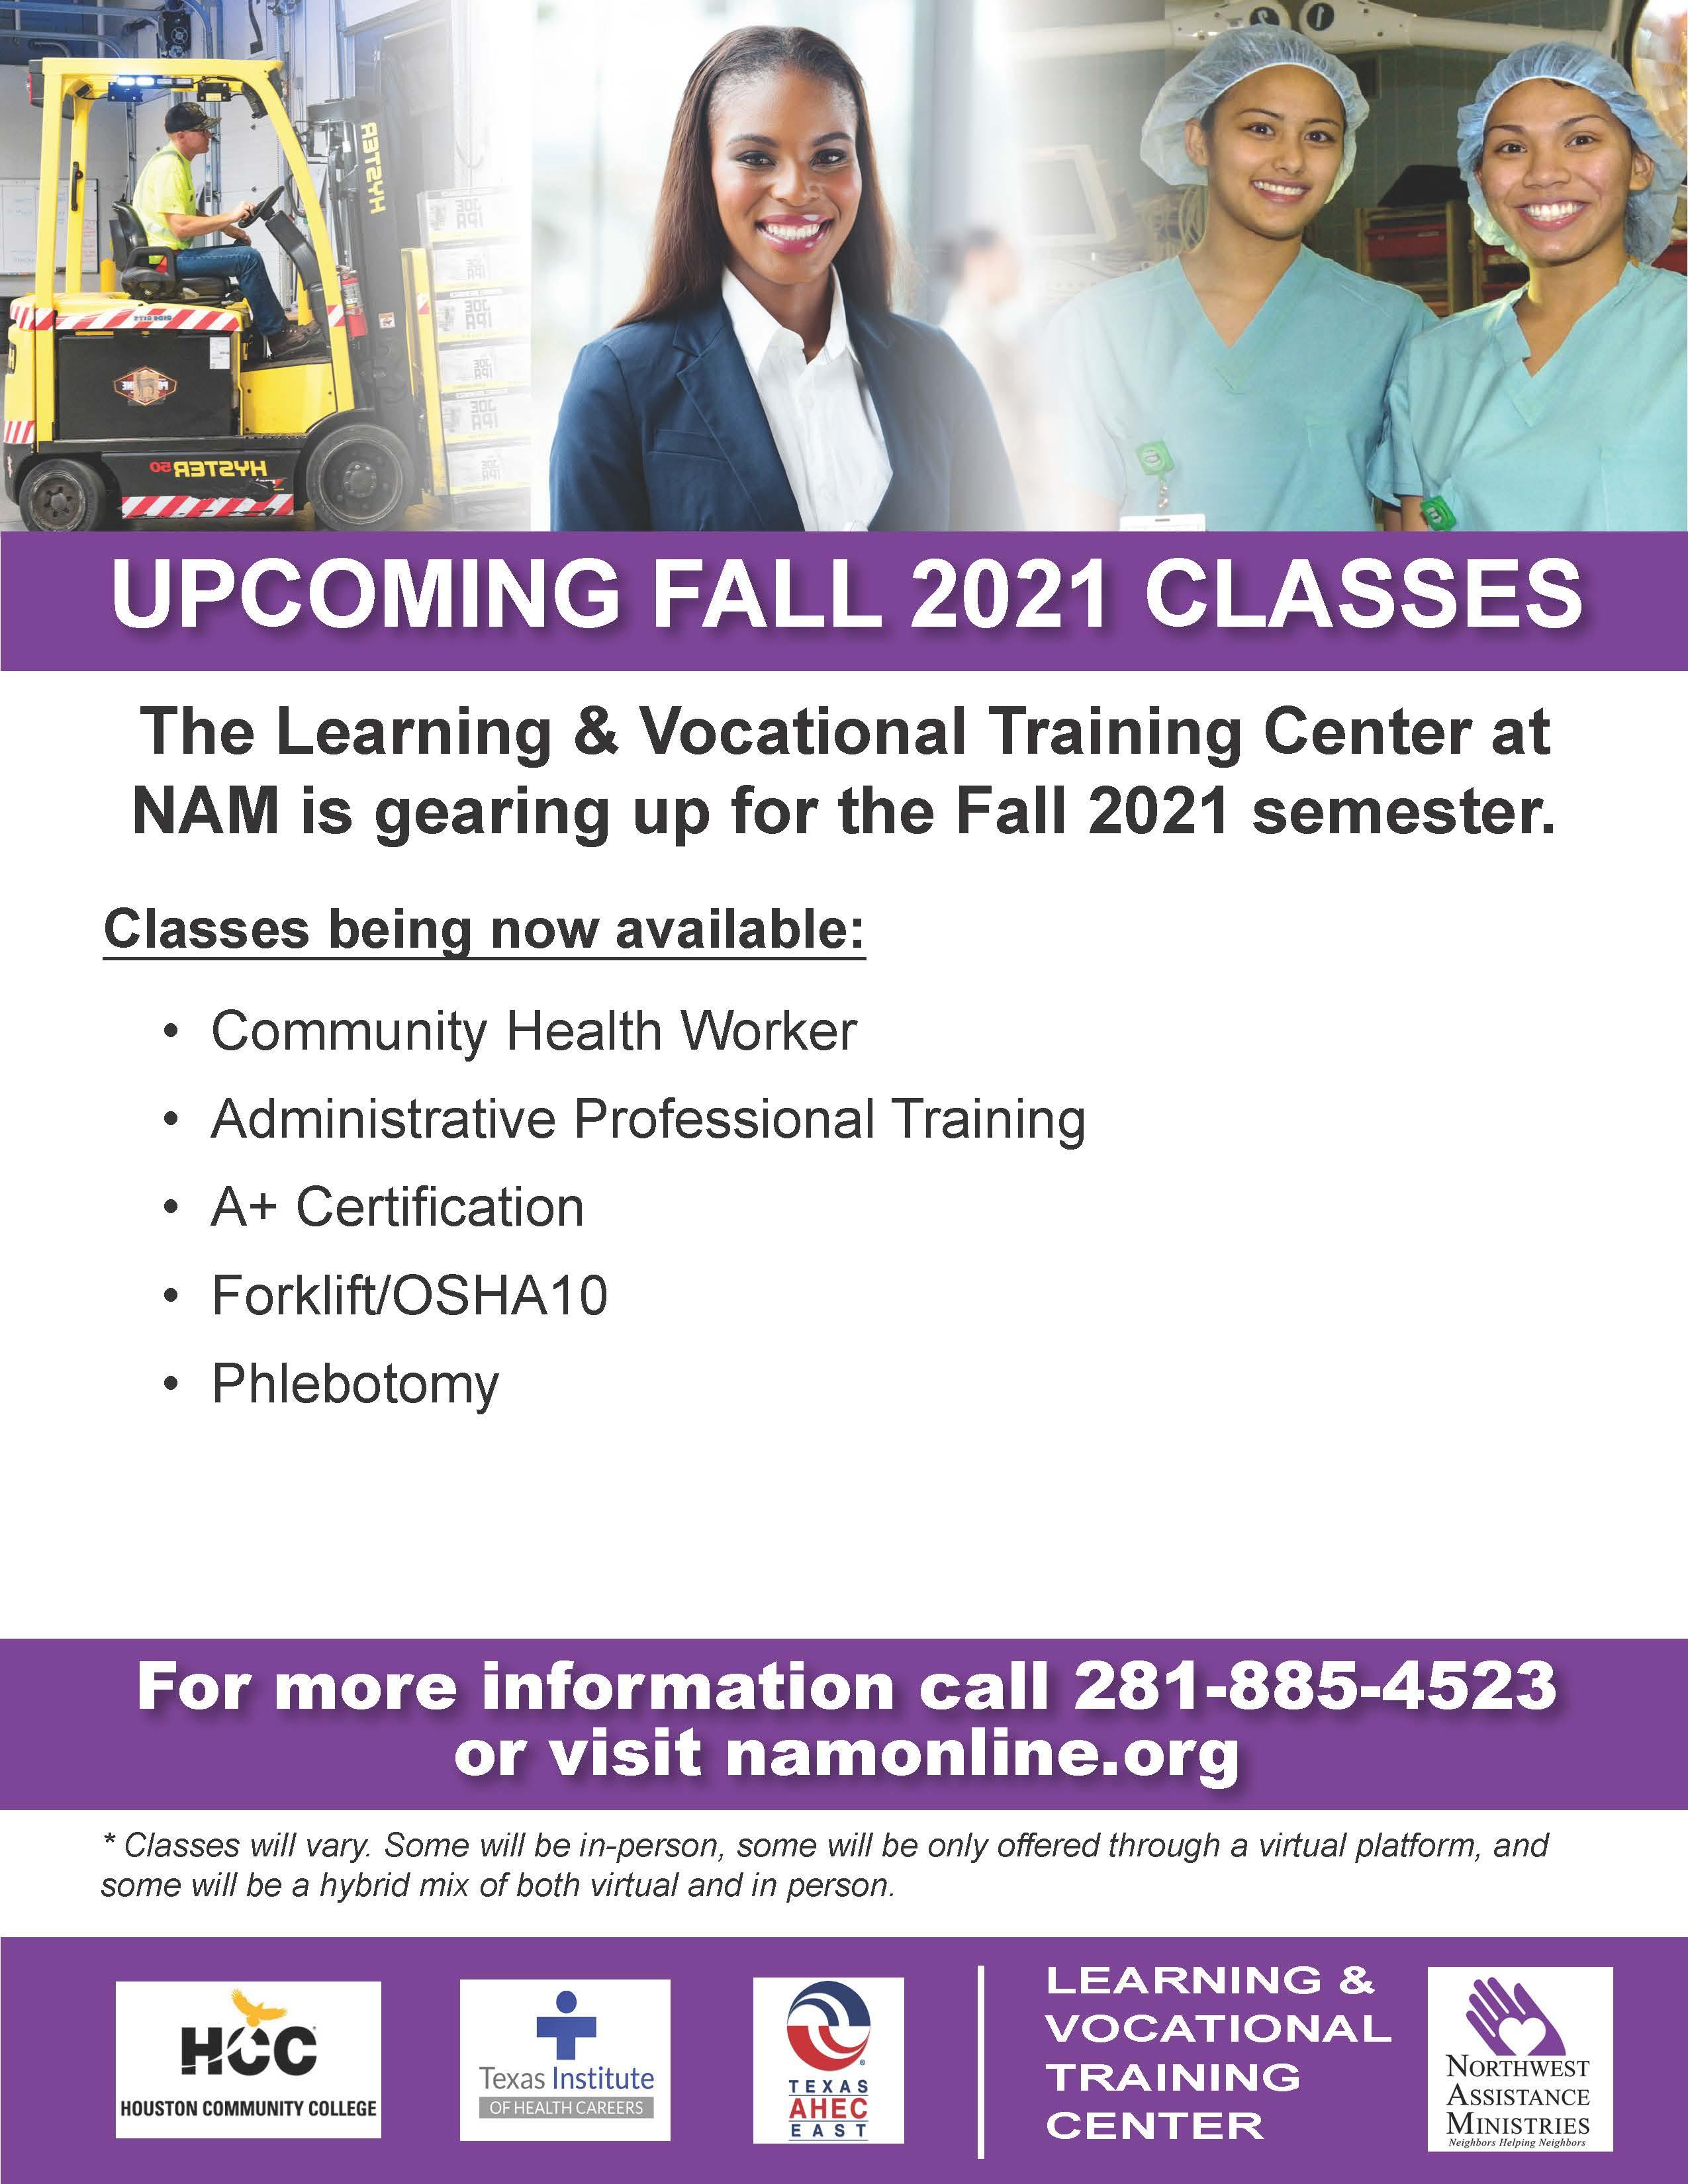 PP-Fall_2021_Classes__-_AUGUST_UPDATE.jpg